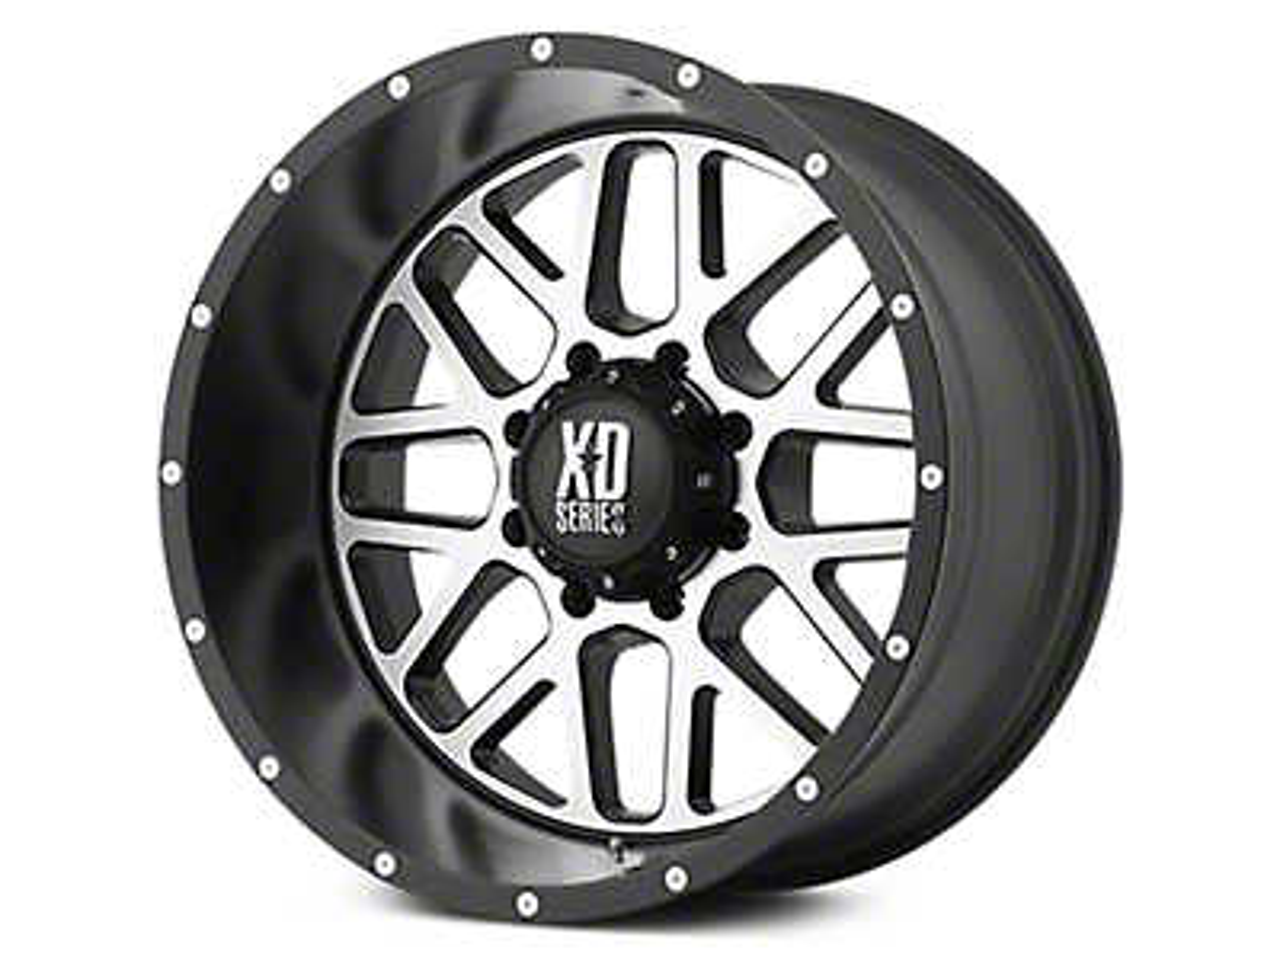 XD Grenade Satin Black Machined 6-Lug Wheel - 20x9 (07-18 Sierra 1500)